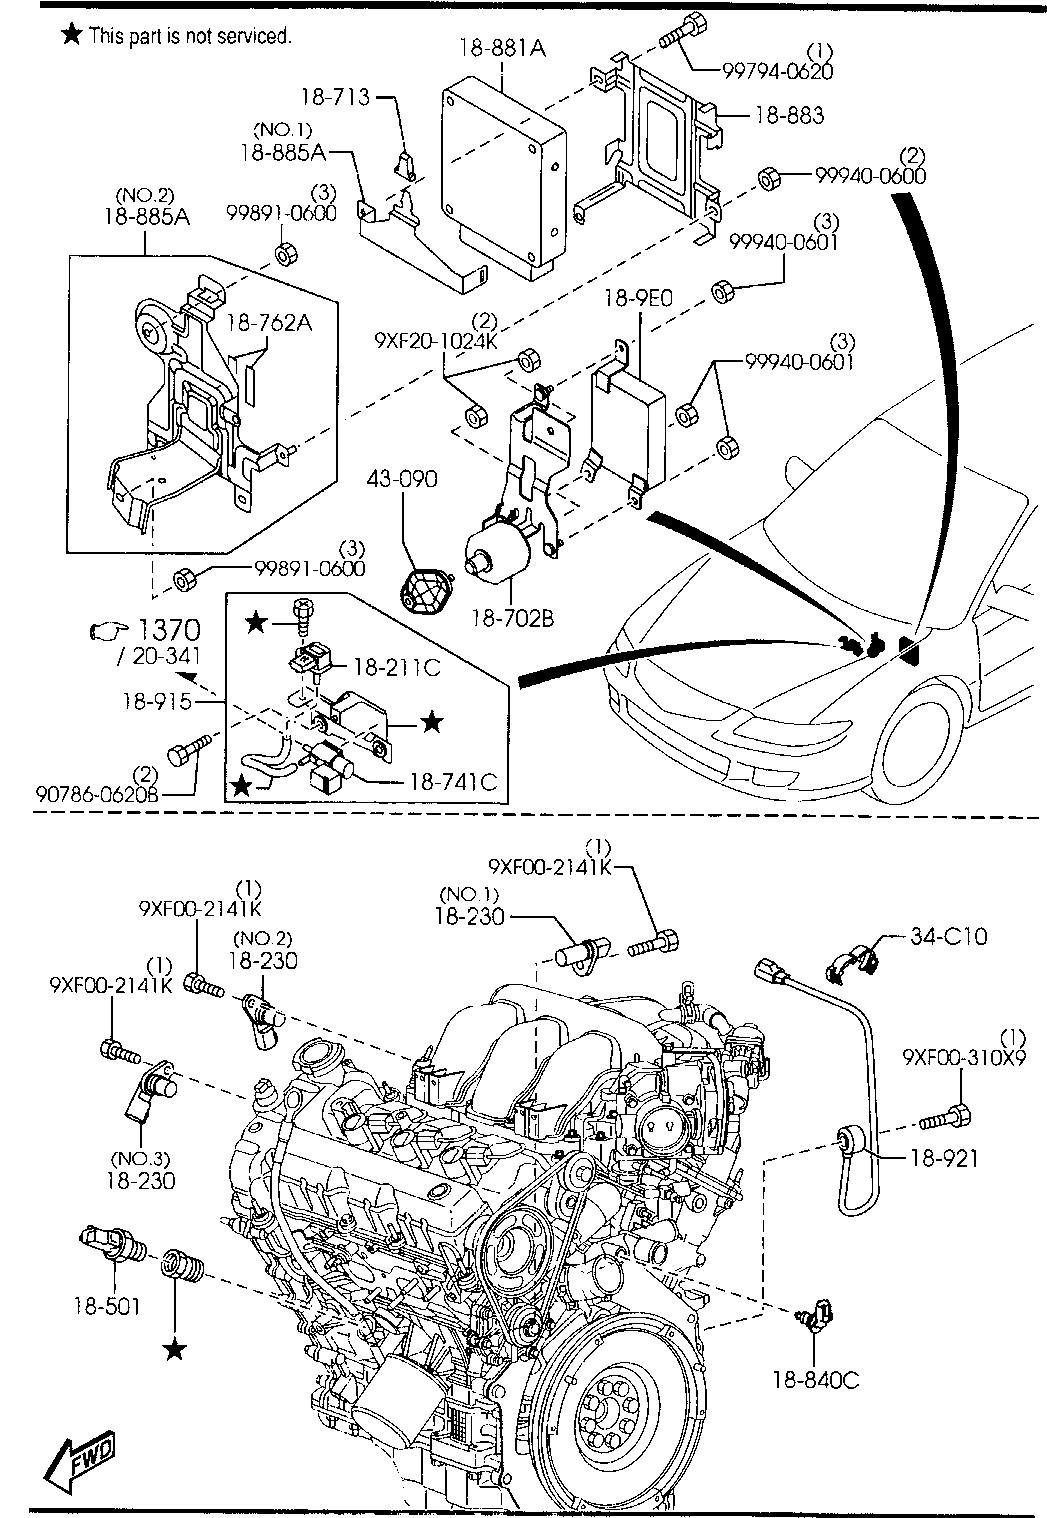 04 Mazda 6 Engine Diagram Wiring Diagram Schema Male Track Male Track Atmosphereconcept It